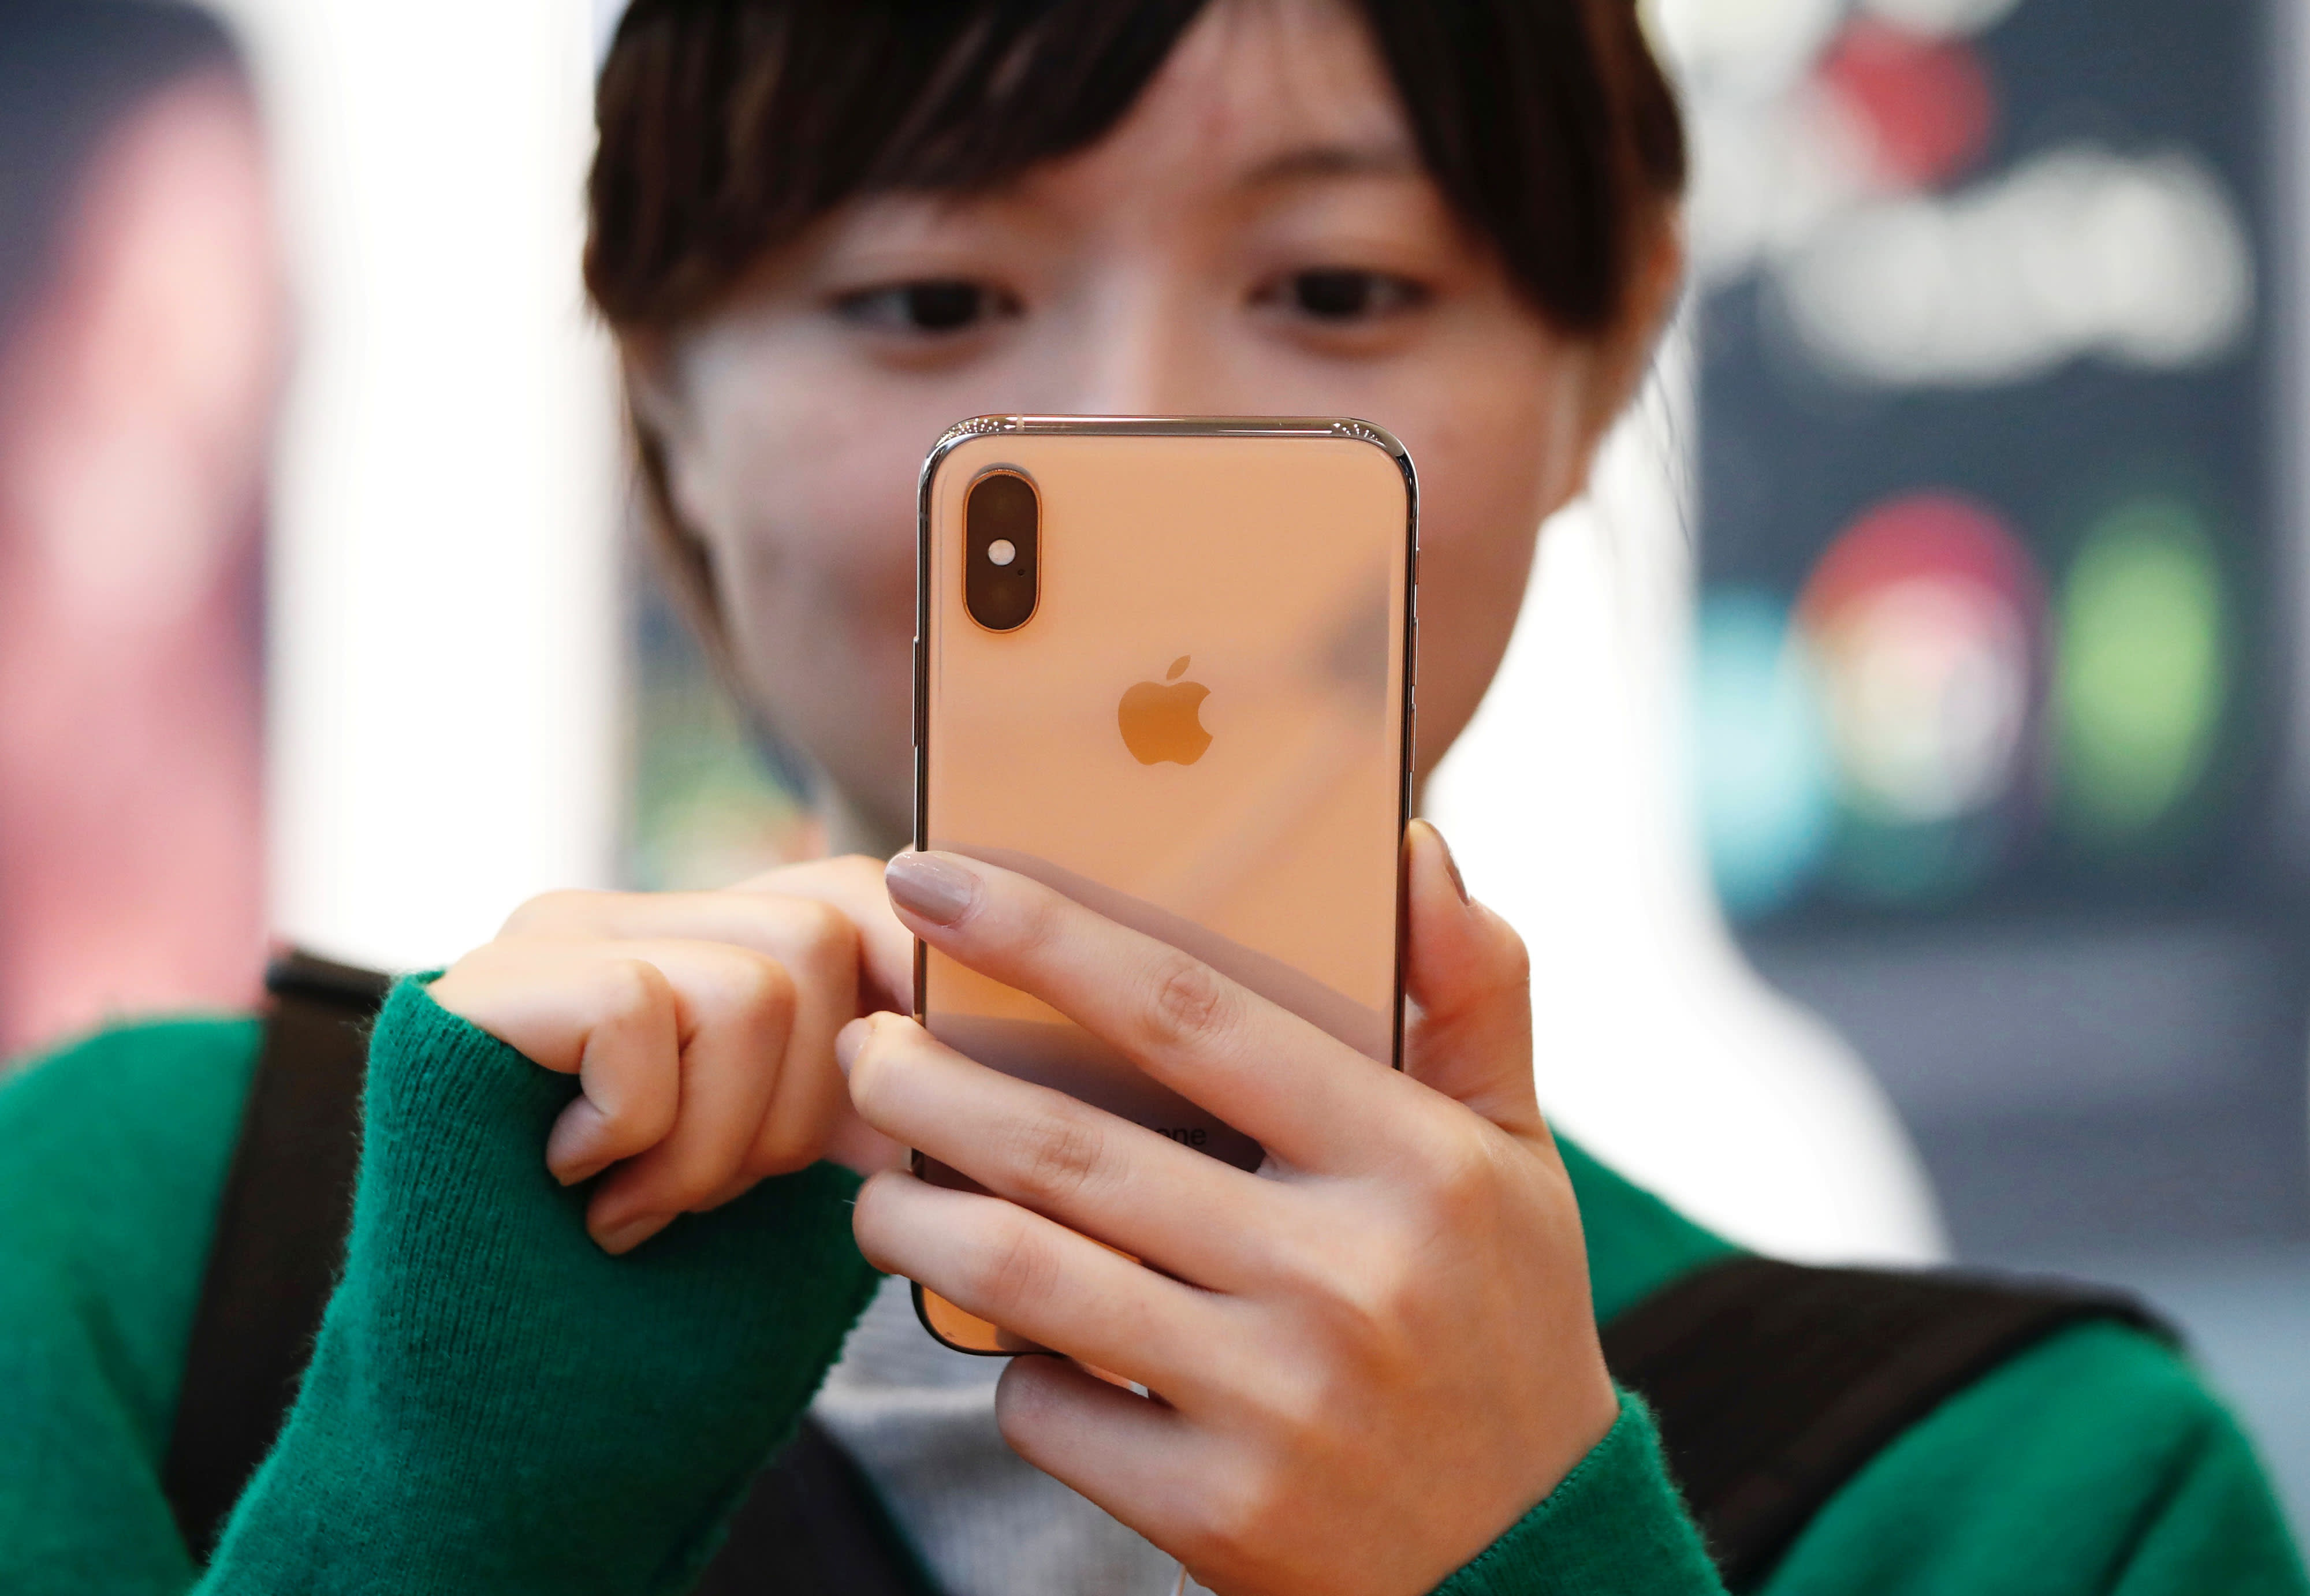 RT: Apple iPhone XS and customer 180921